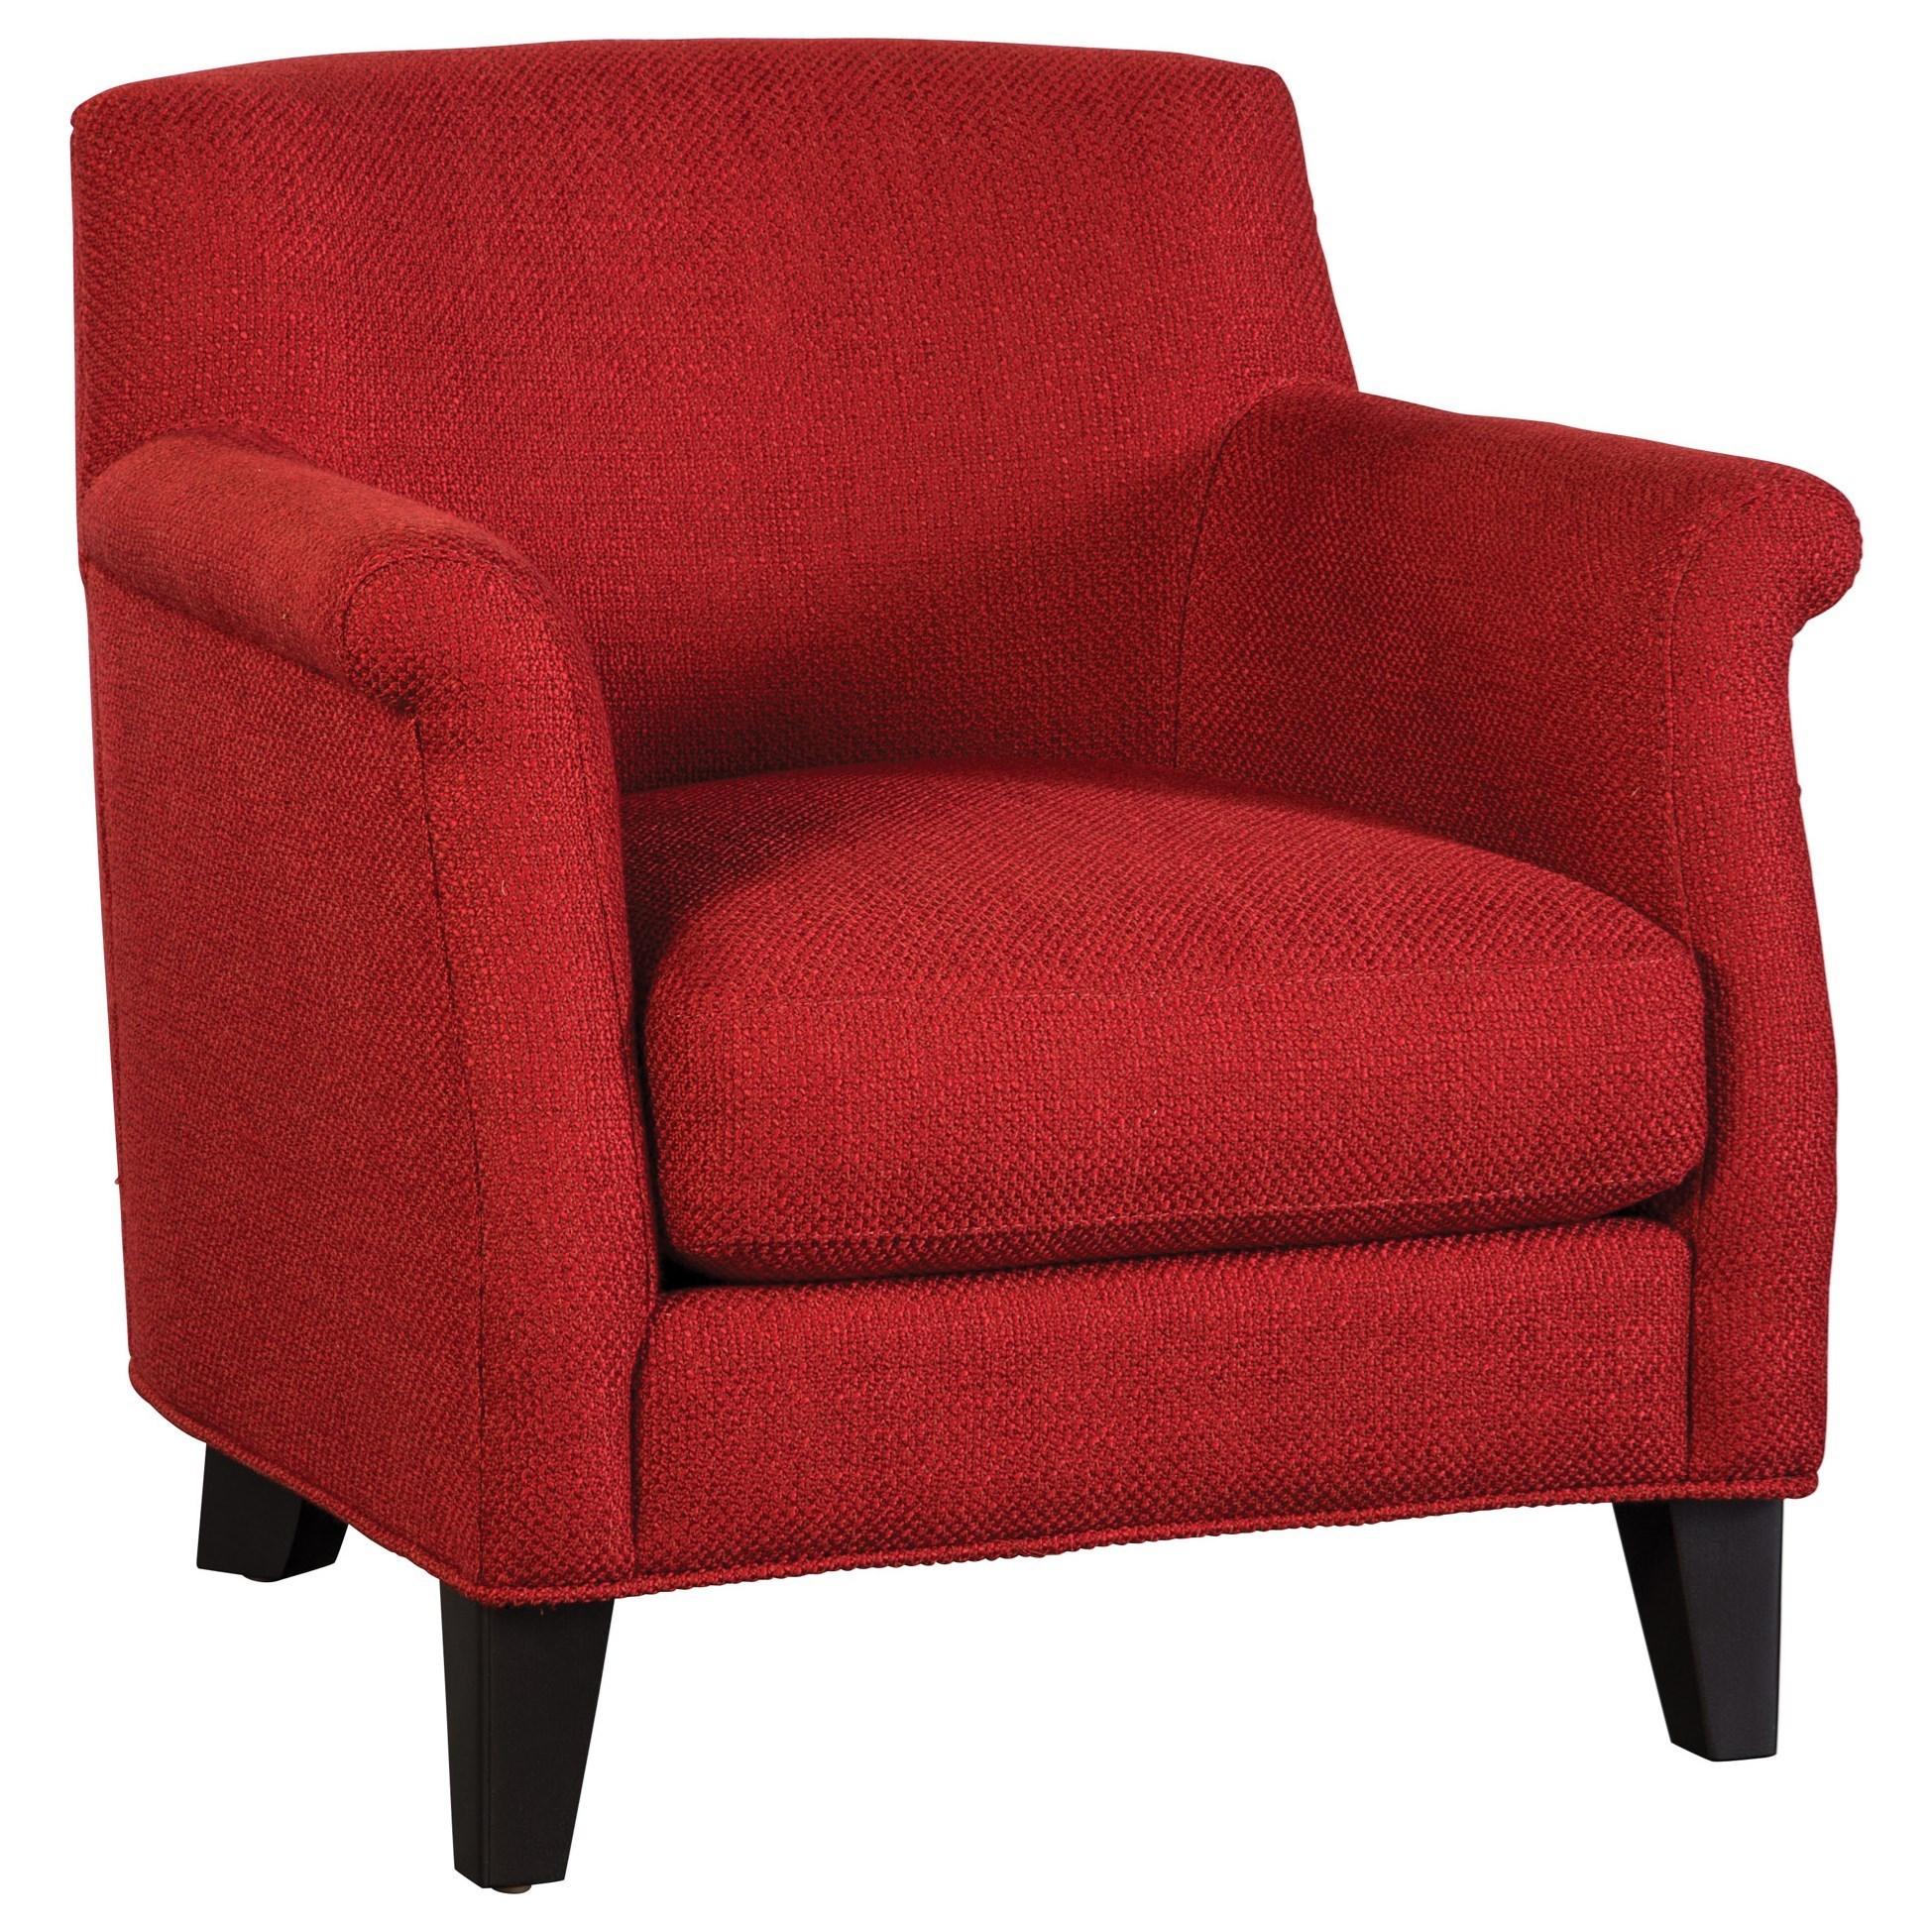 Jonathan Louis Cobi Accent Chair - Item Number: 04157-Bennett Red